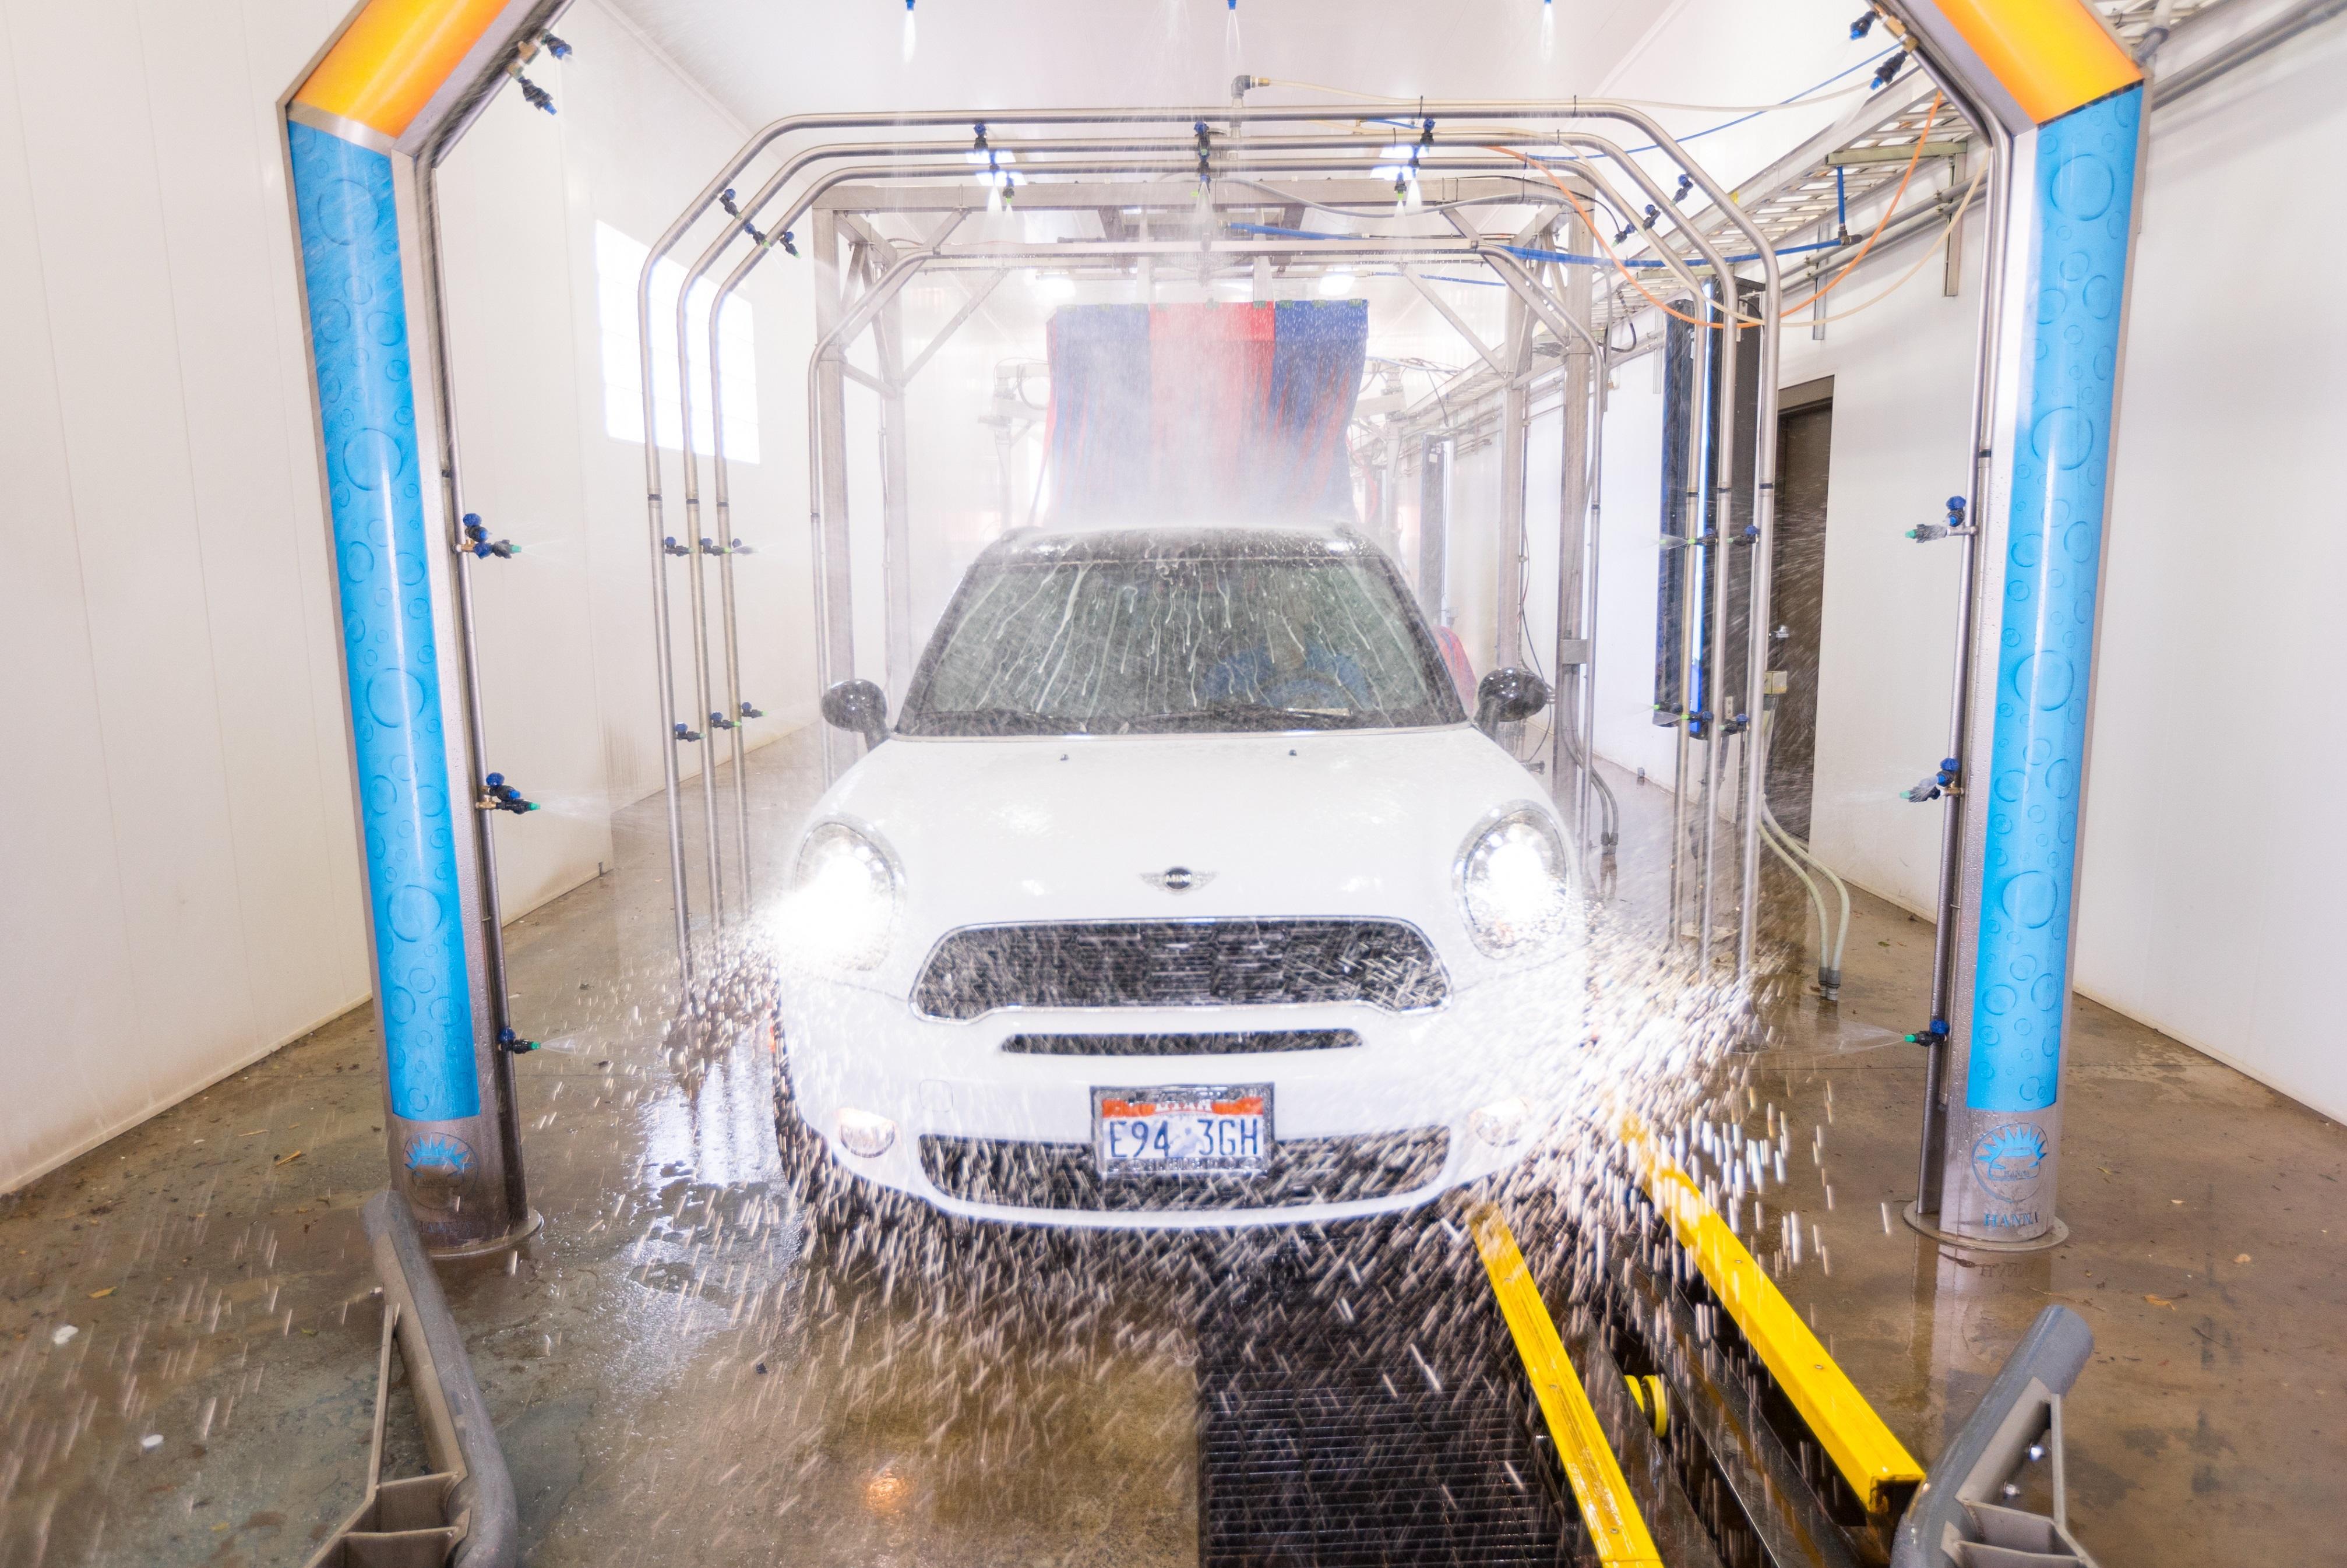 Tagg N Go Express Car Wash image 6